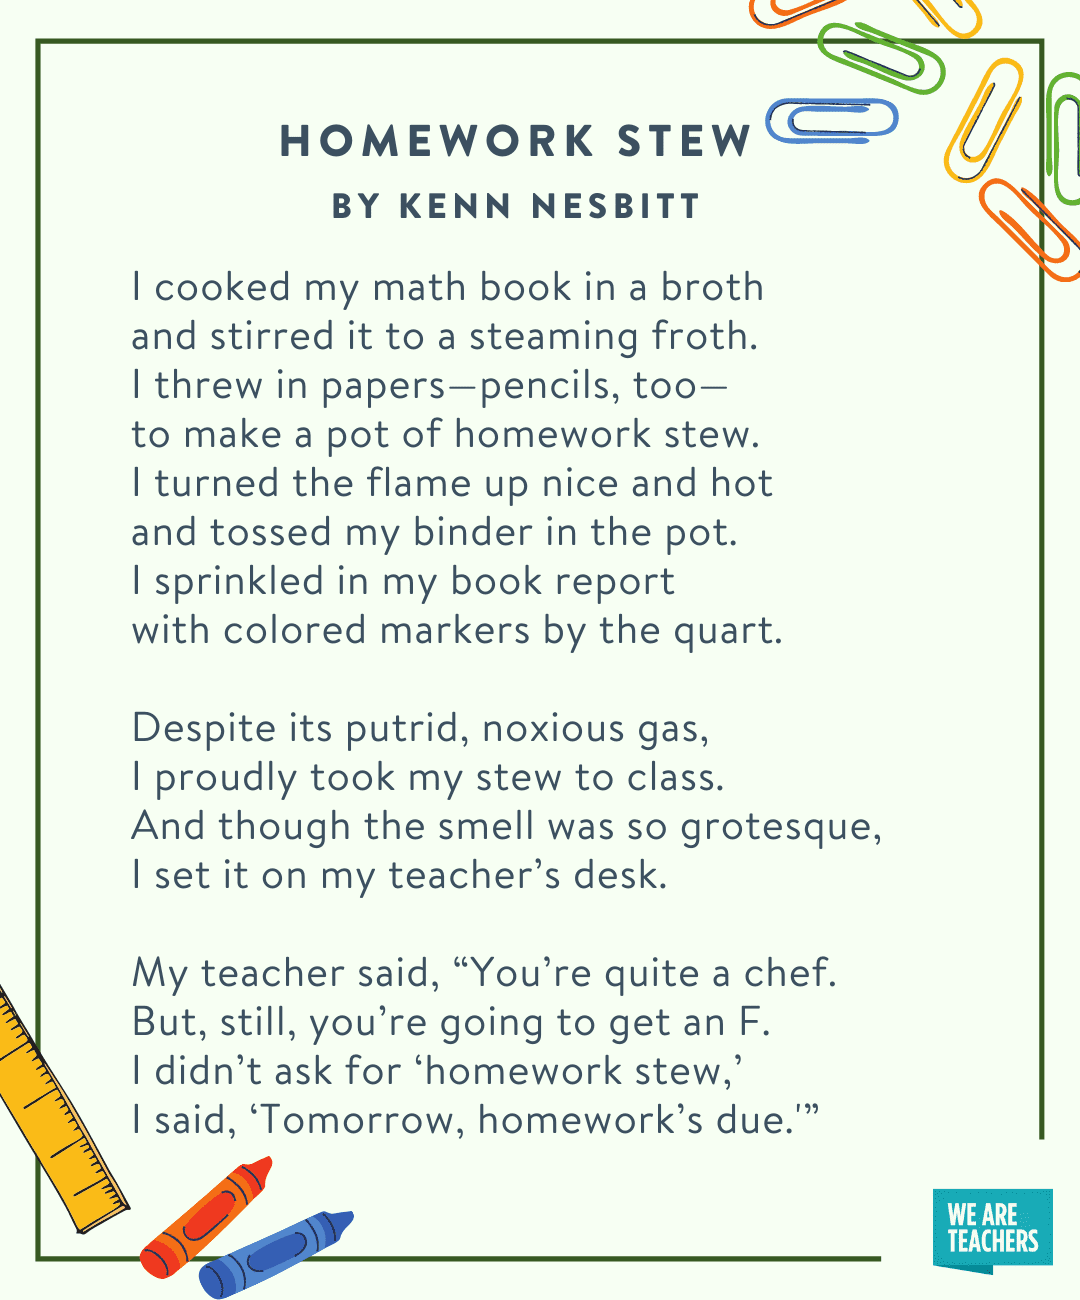 Homework Stew by Kenn Nesbitt -- fifth grade poems